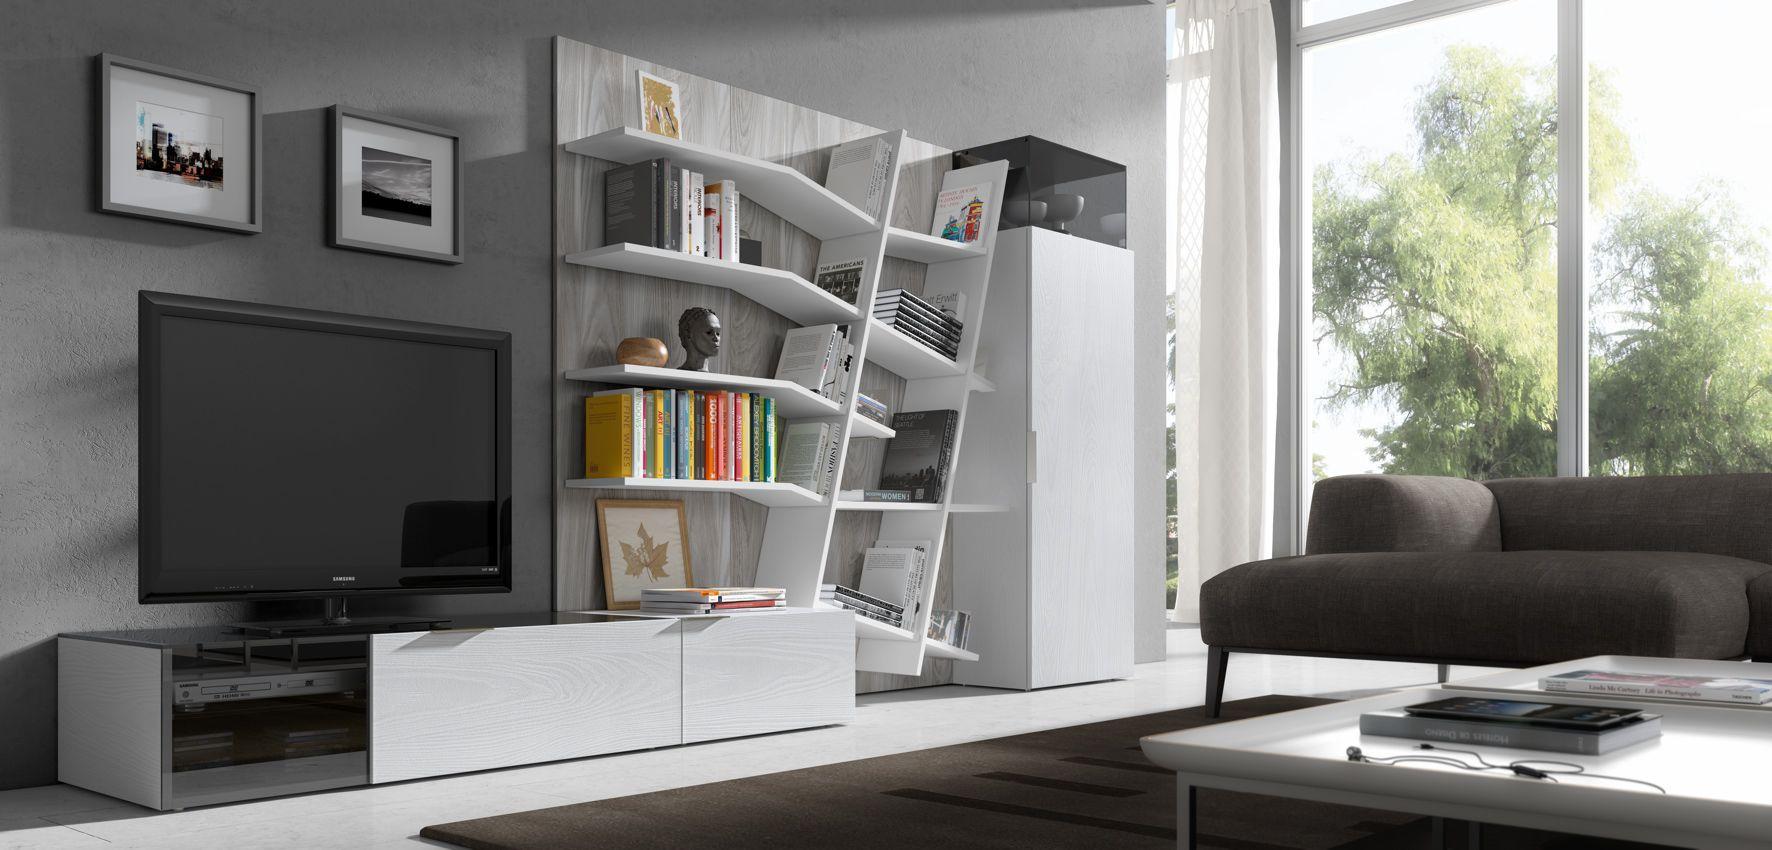 Contemporary Tv Wall Unit Lacquered Wood Hi Fi Iline 1  # Muebles Piferrer Iline